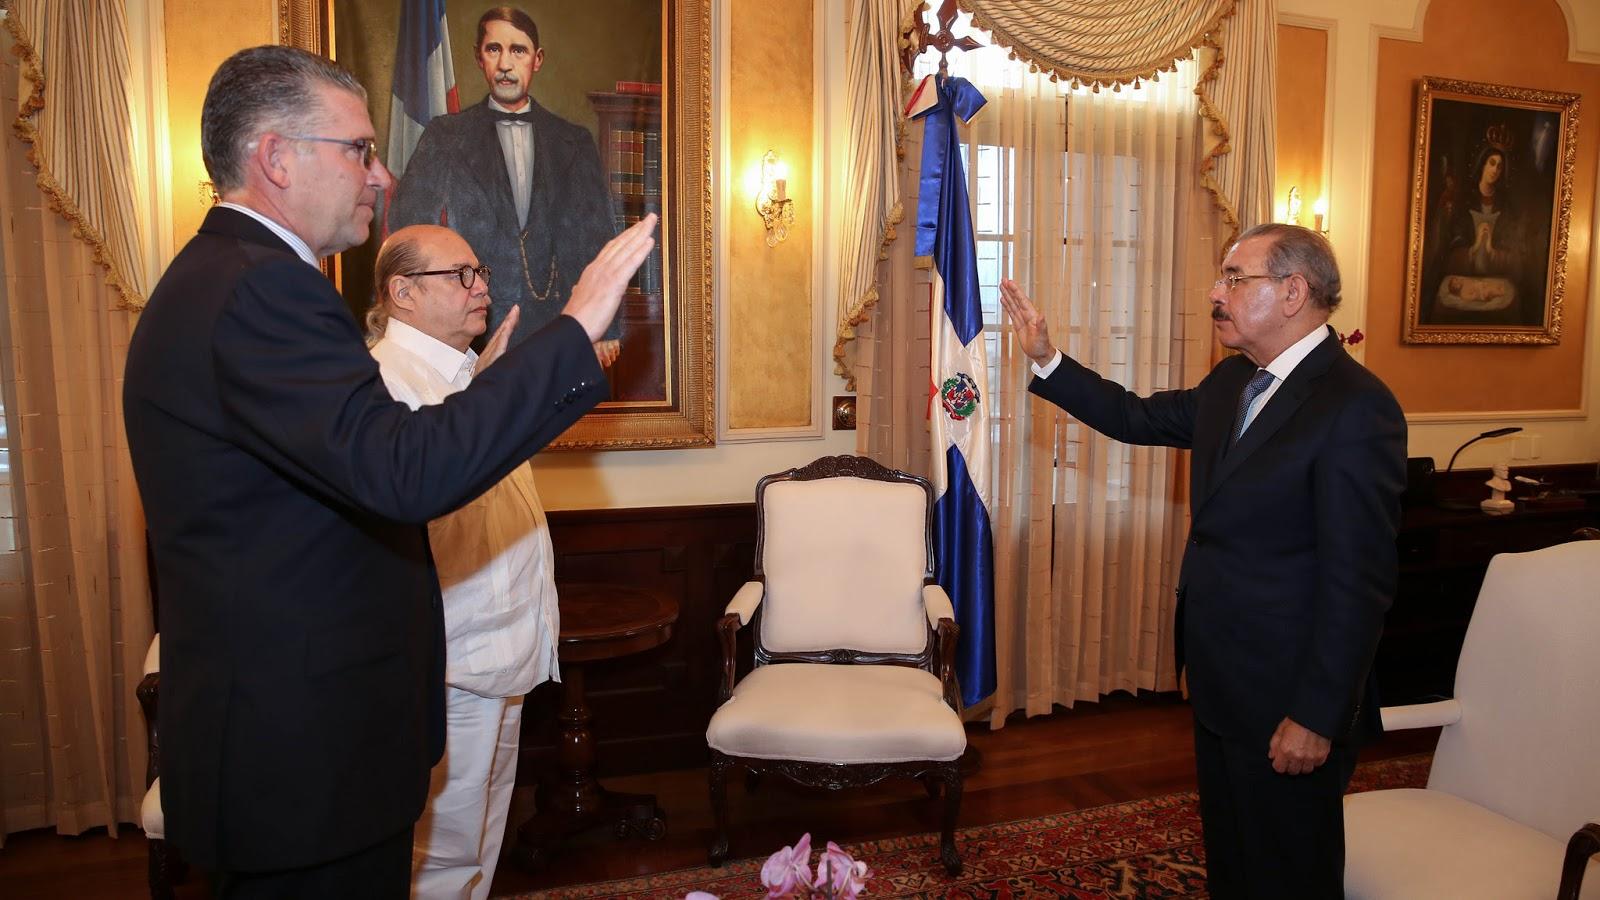 VIDEO: Presidente Danilo Medina juramenta a Víctor Víctor y Eric Rivero